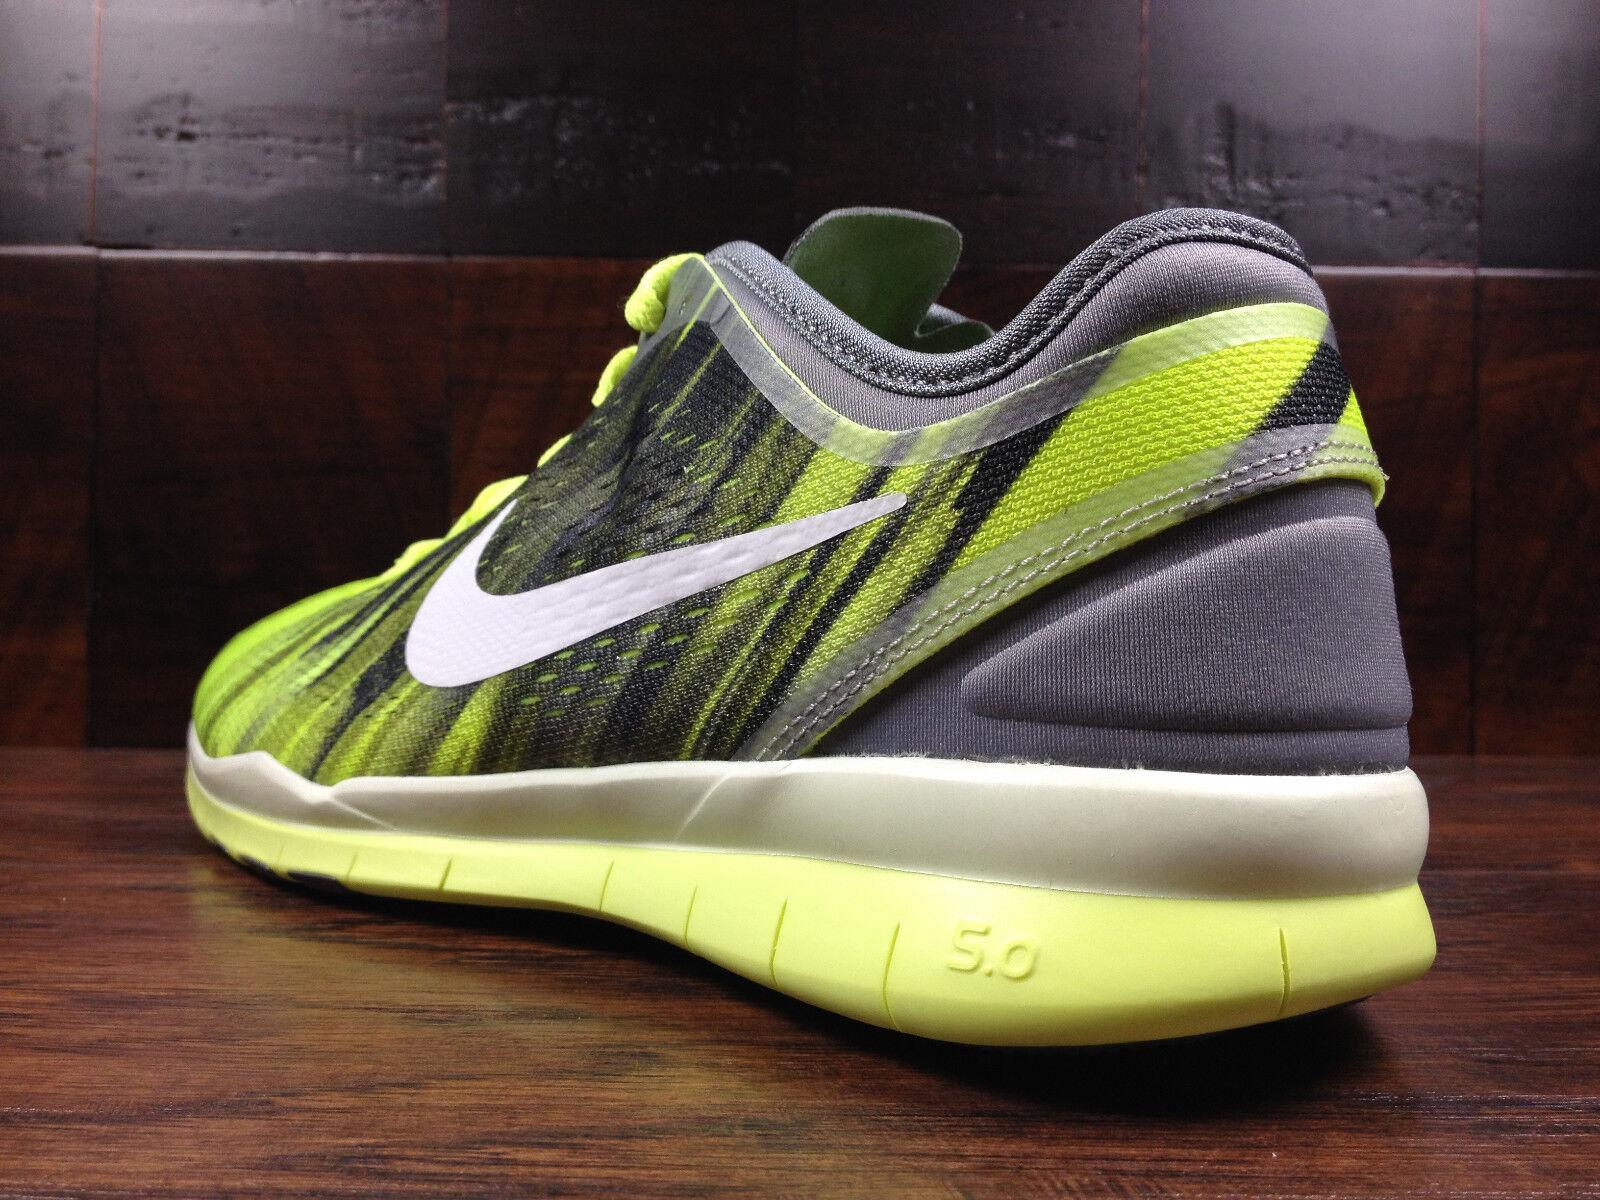 exclusive shoes best deals on amazon Nike Womens Cool Grey Black Volt 5.0 TR Fit 5 Gym Tennis Shoe 9 ...